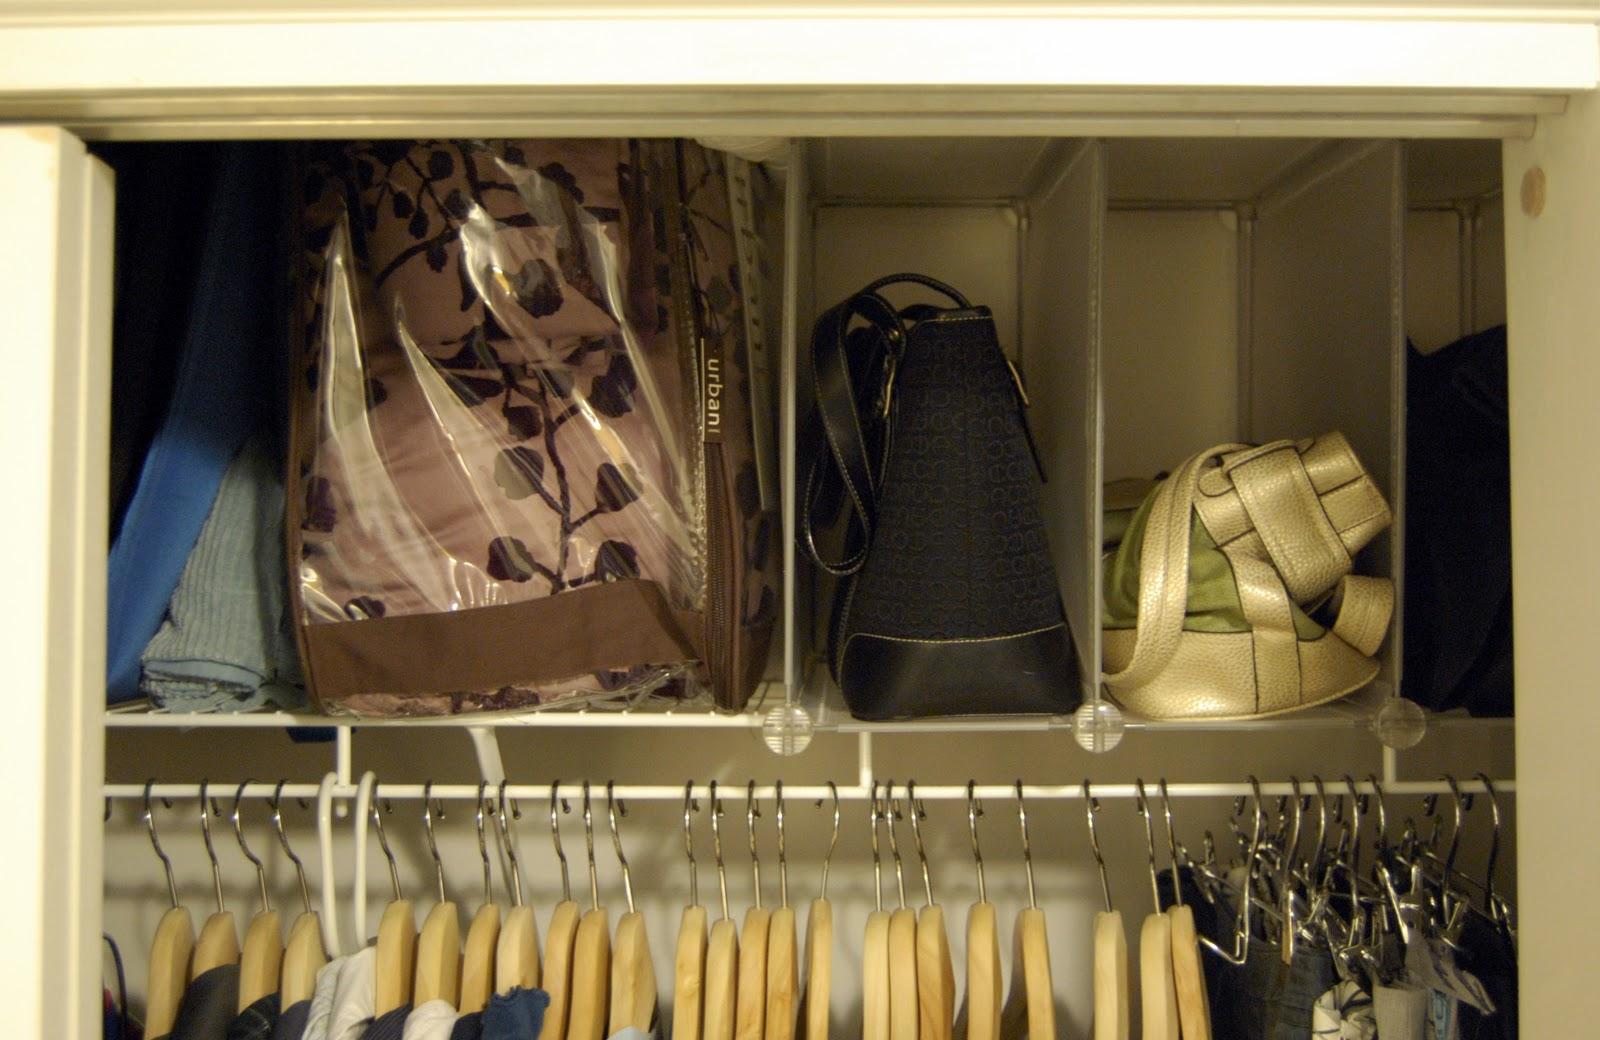 Michael Graves For Target 6 Shelf Organizer Organizer Sedona. Organized  Bedroom Closet